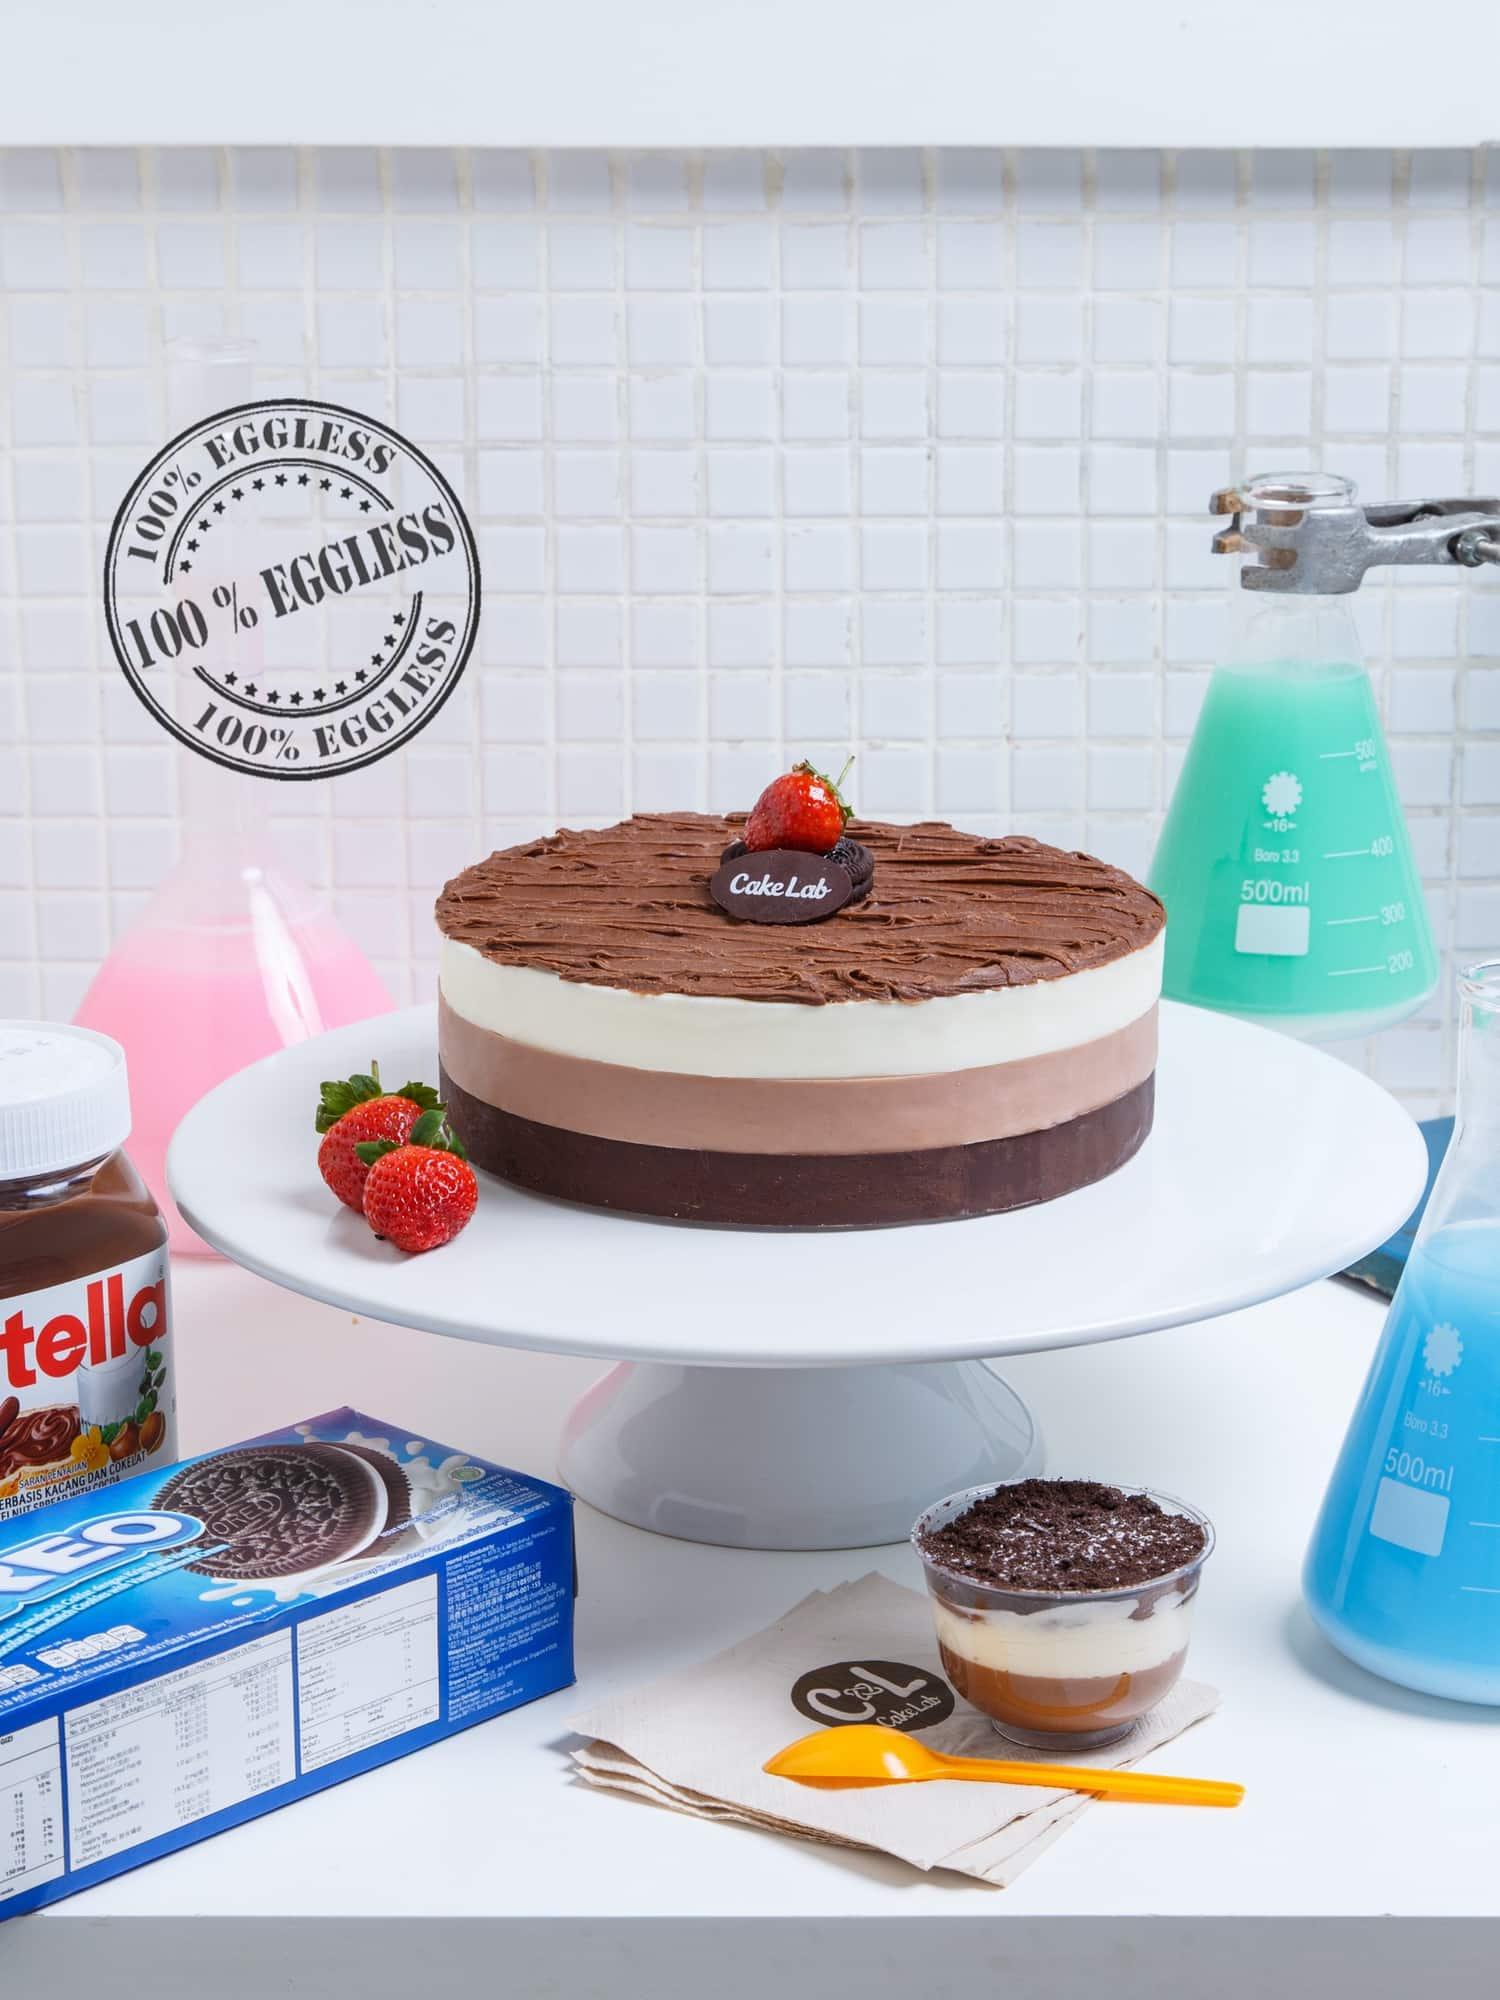 Best Chocolate Birthday Cake In Jakarta Pastry Jakarta Online Cakelab